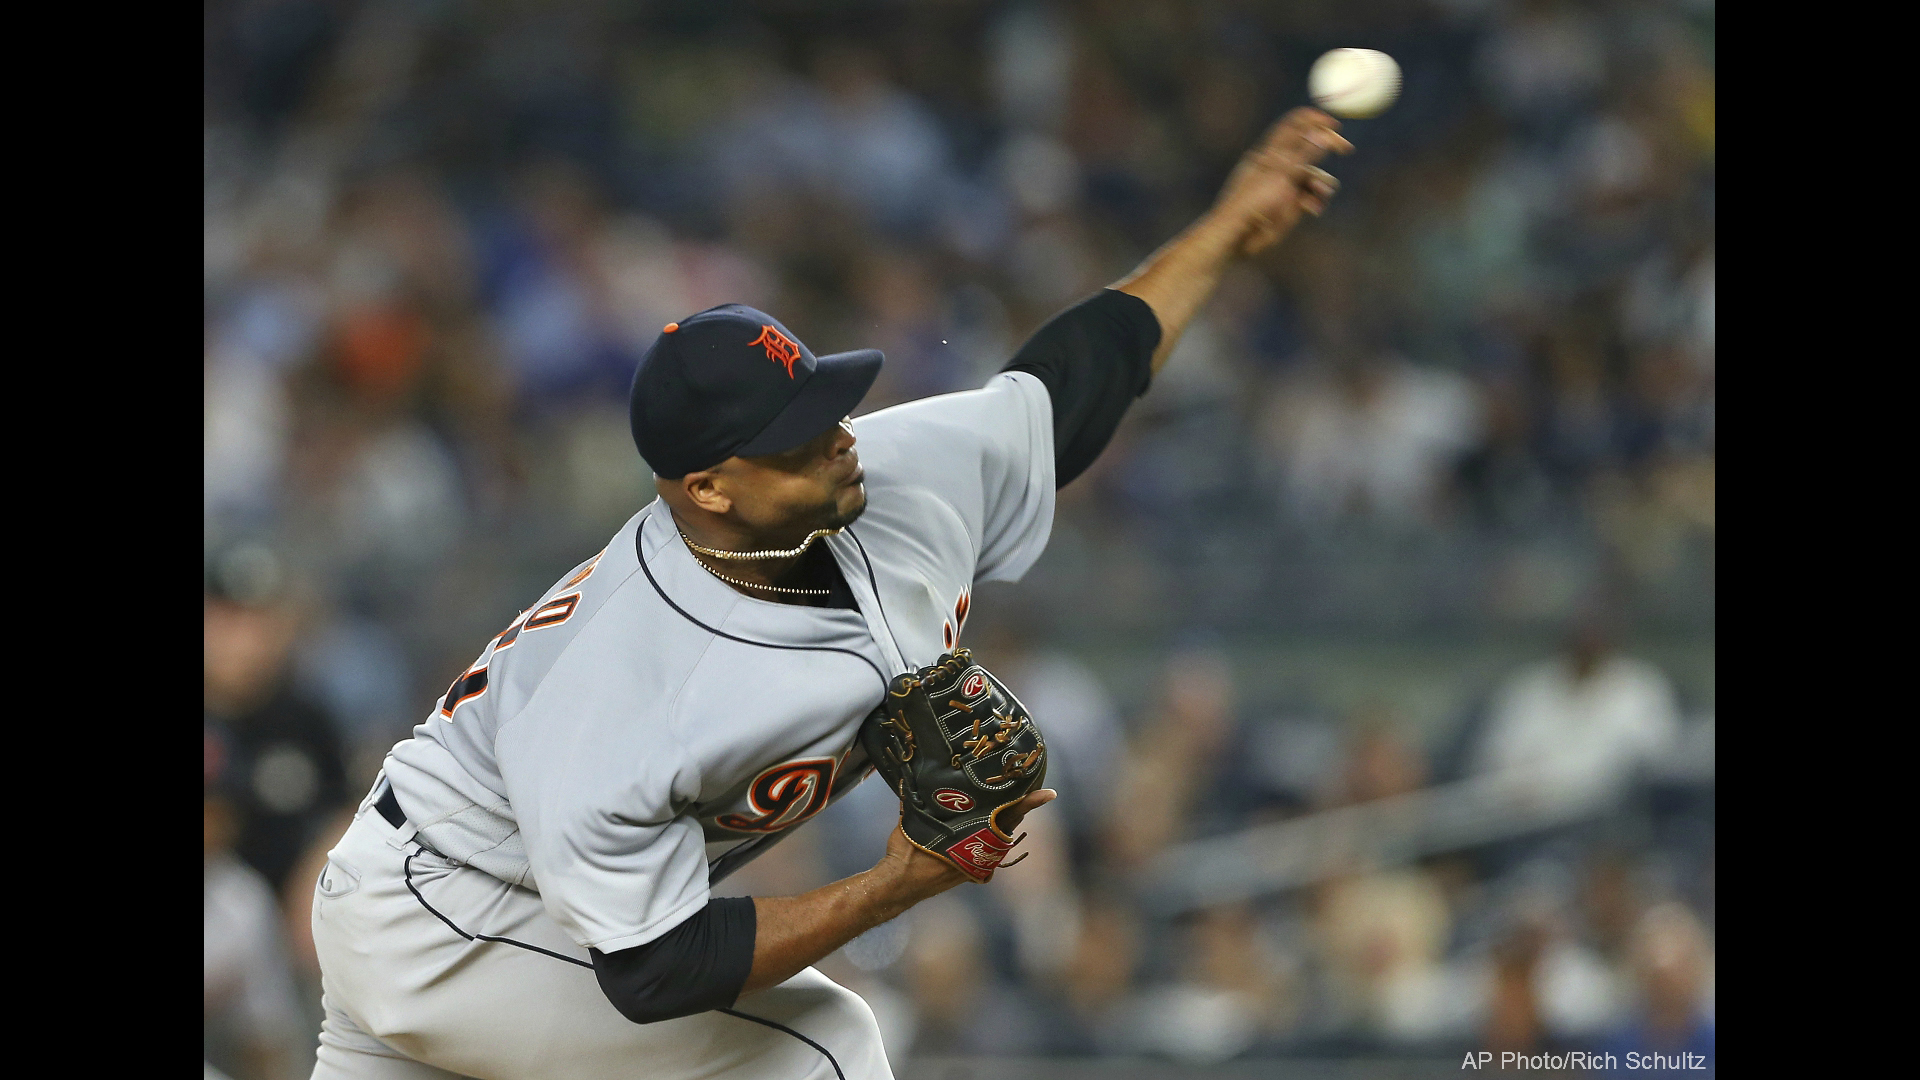 Detroit Tigers Francisco Liriano 083018 AP_1535681554150